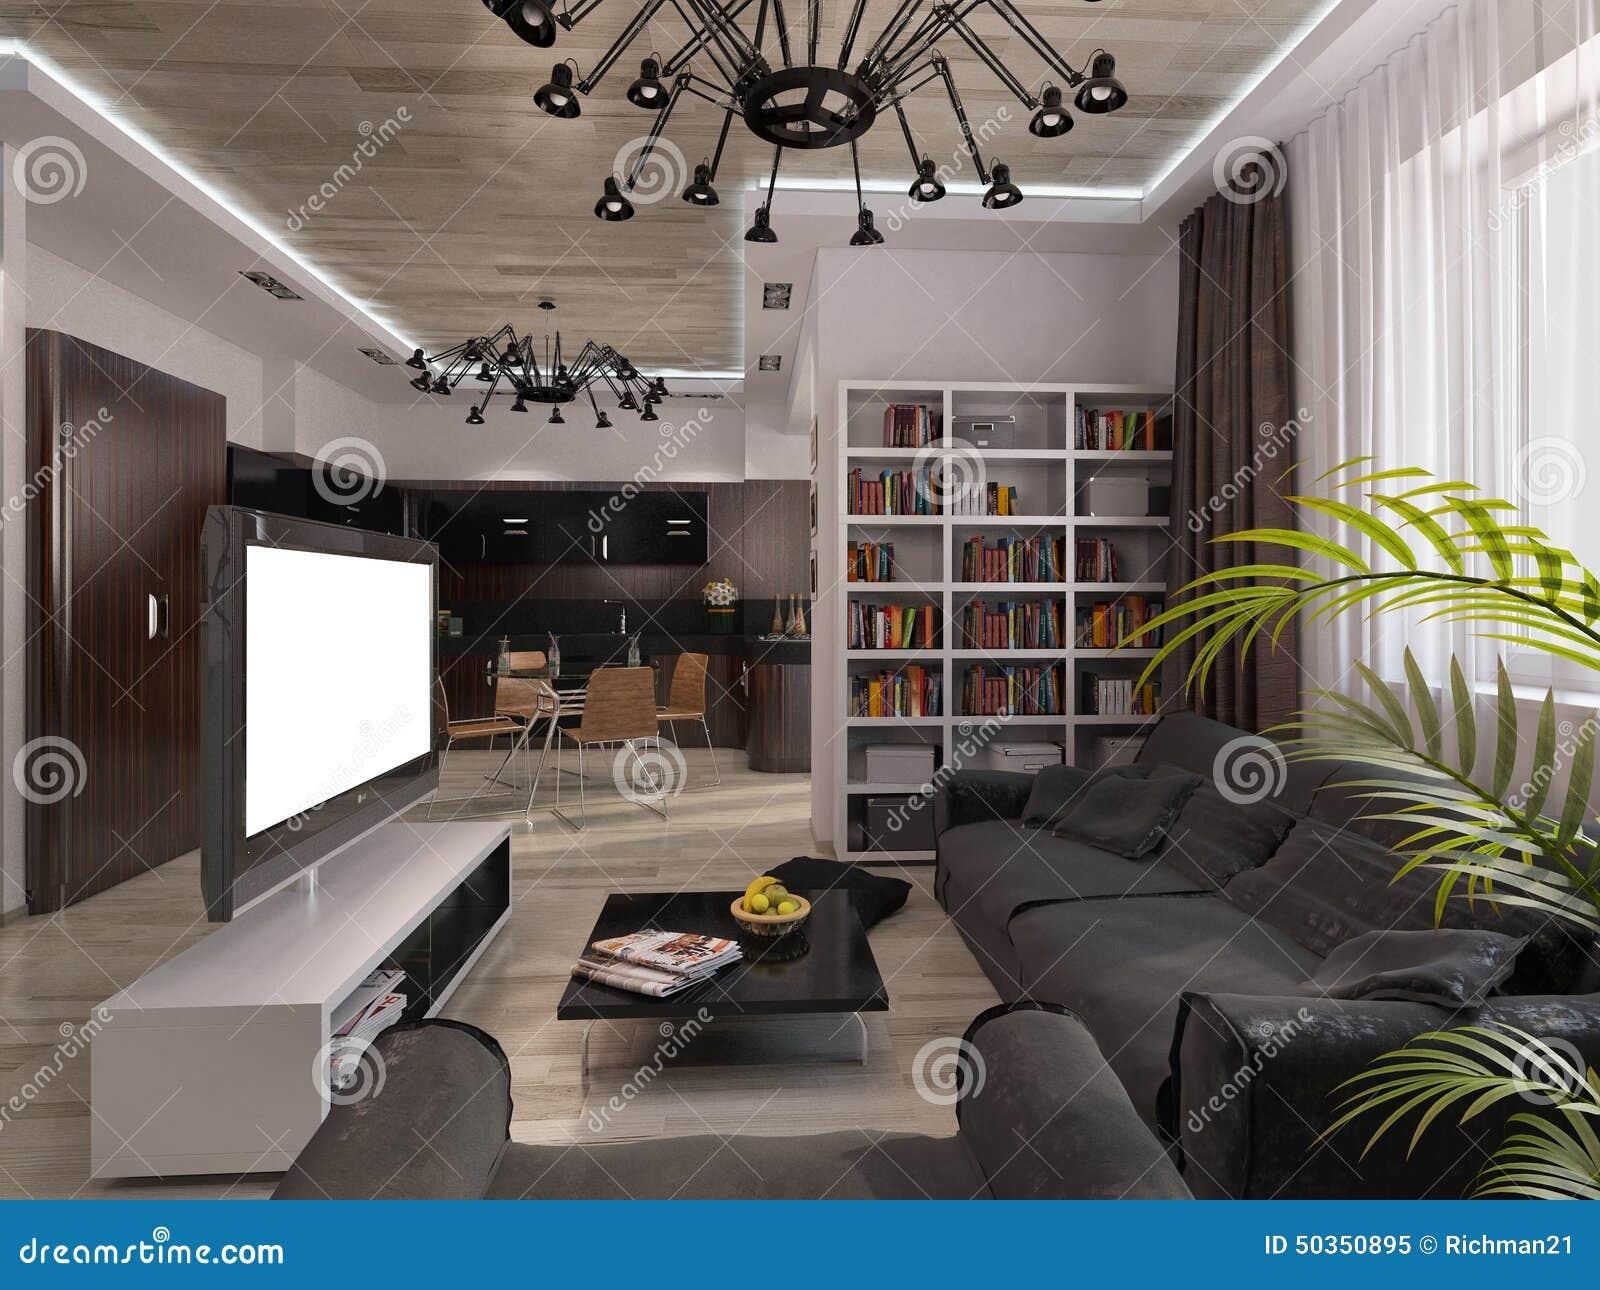 Design living room with warm colors stock illustration for 3d room color design